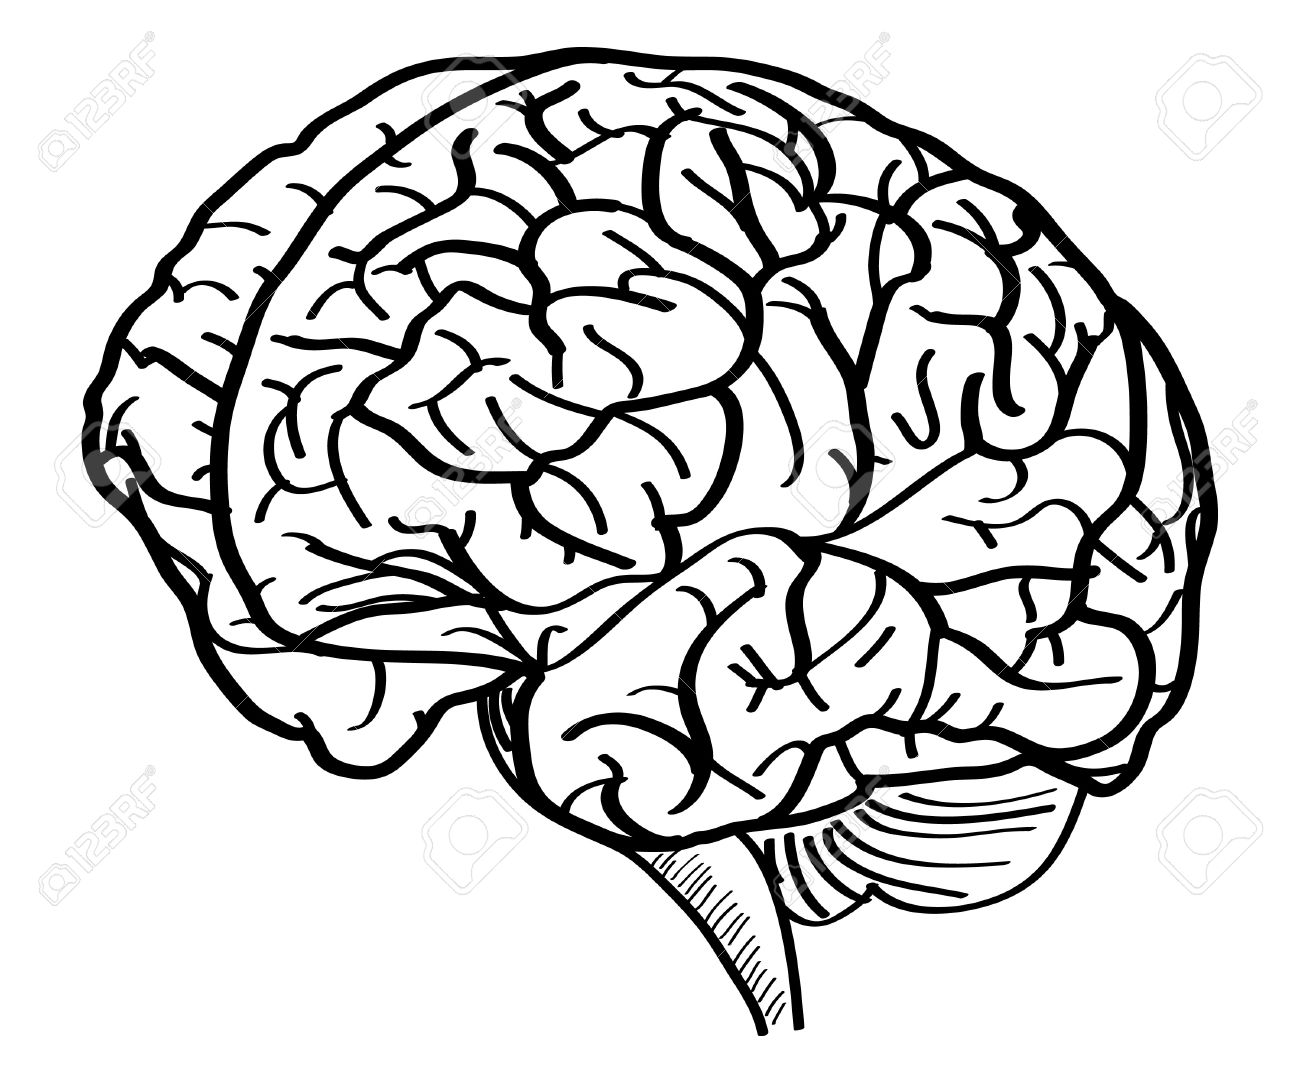 1300x1083 Human Brain Vector Outline Sketched Up, Vector Illustration